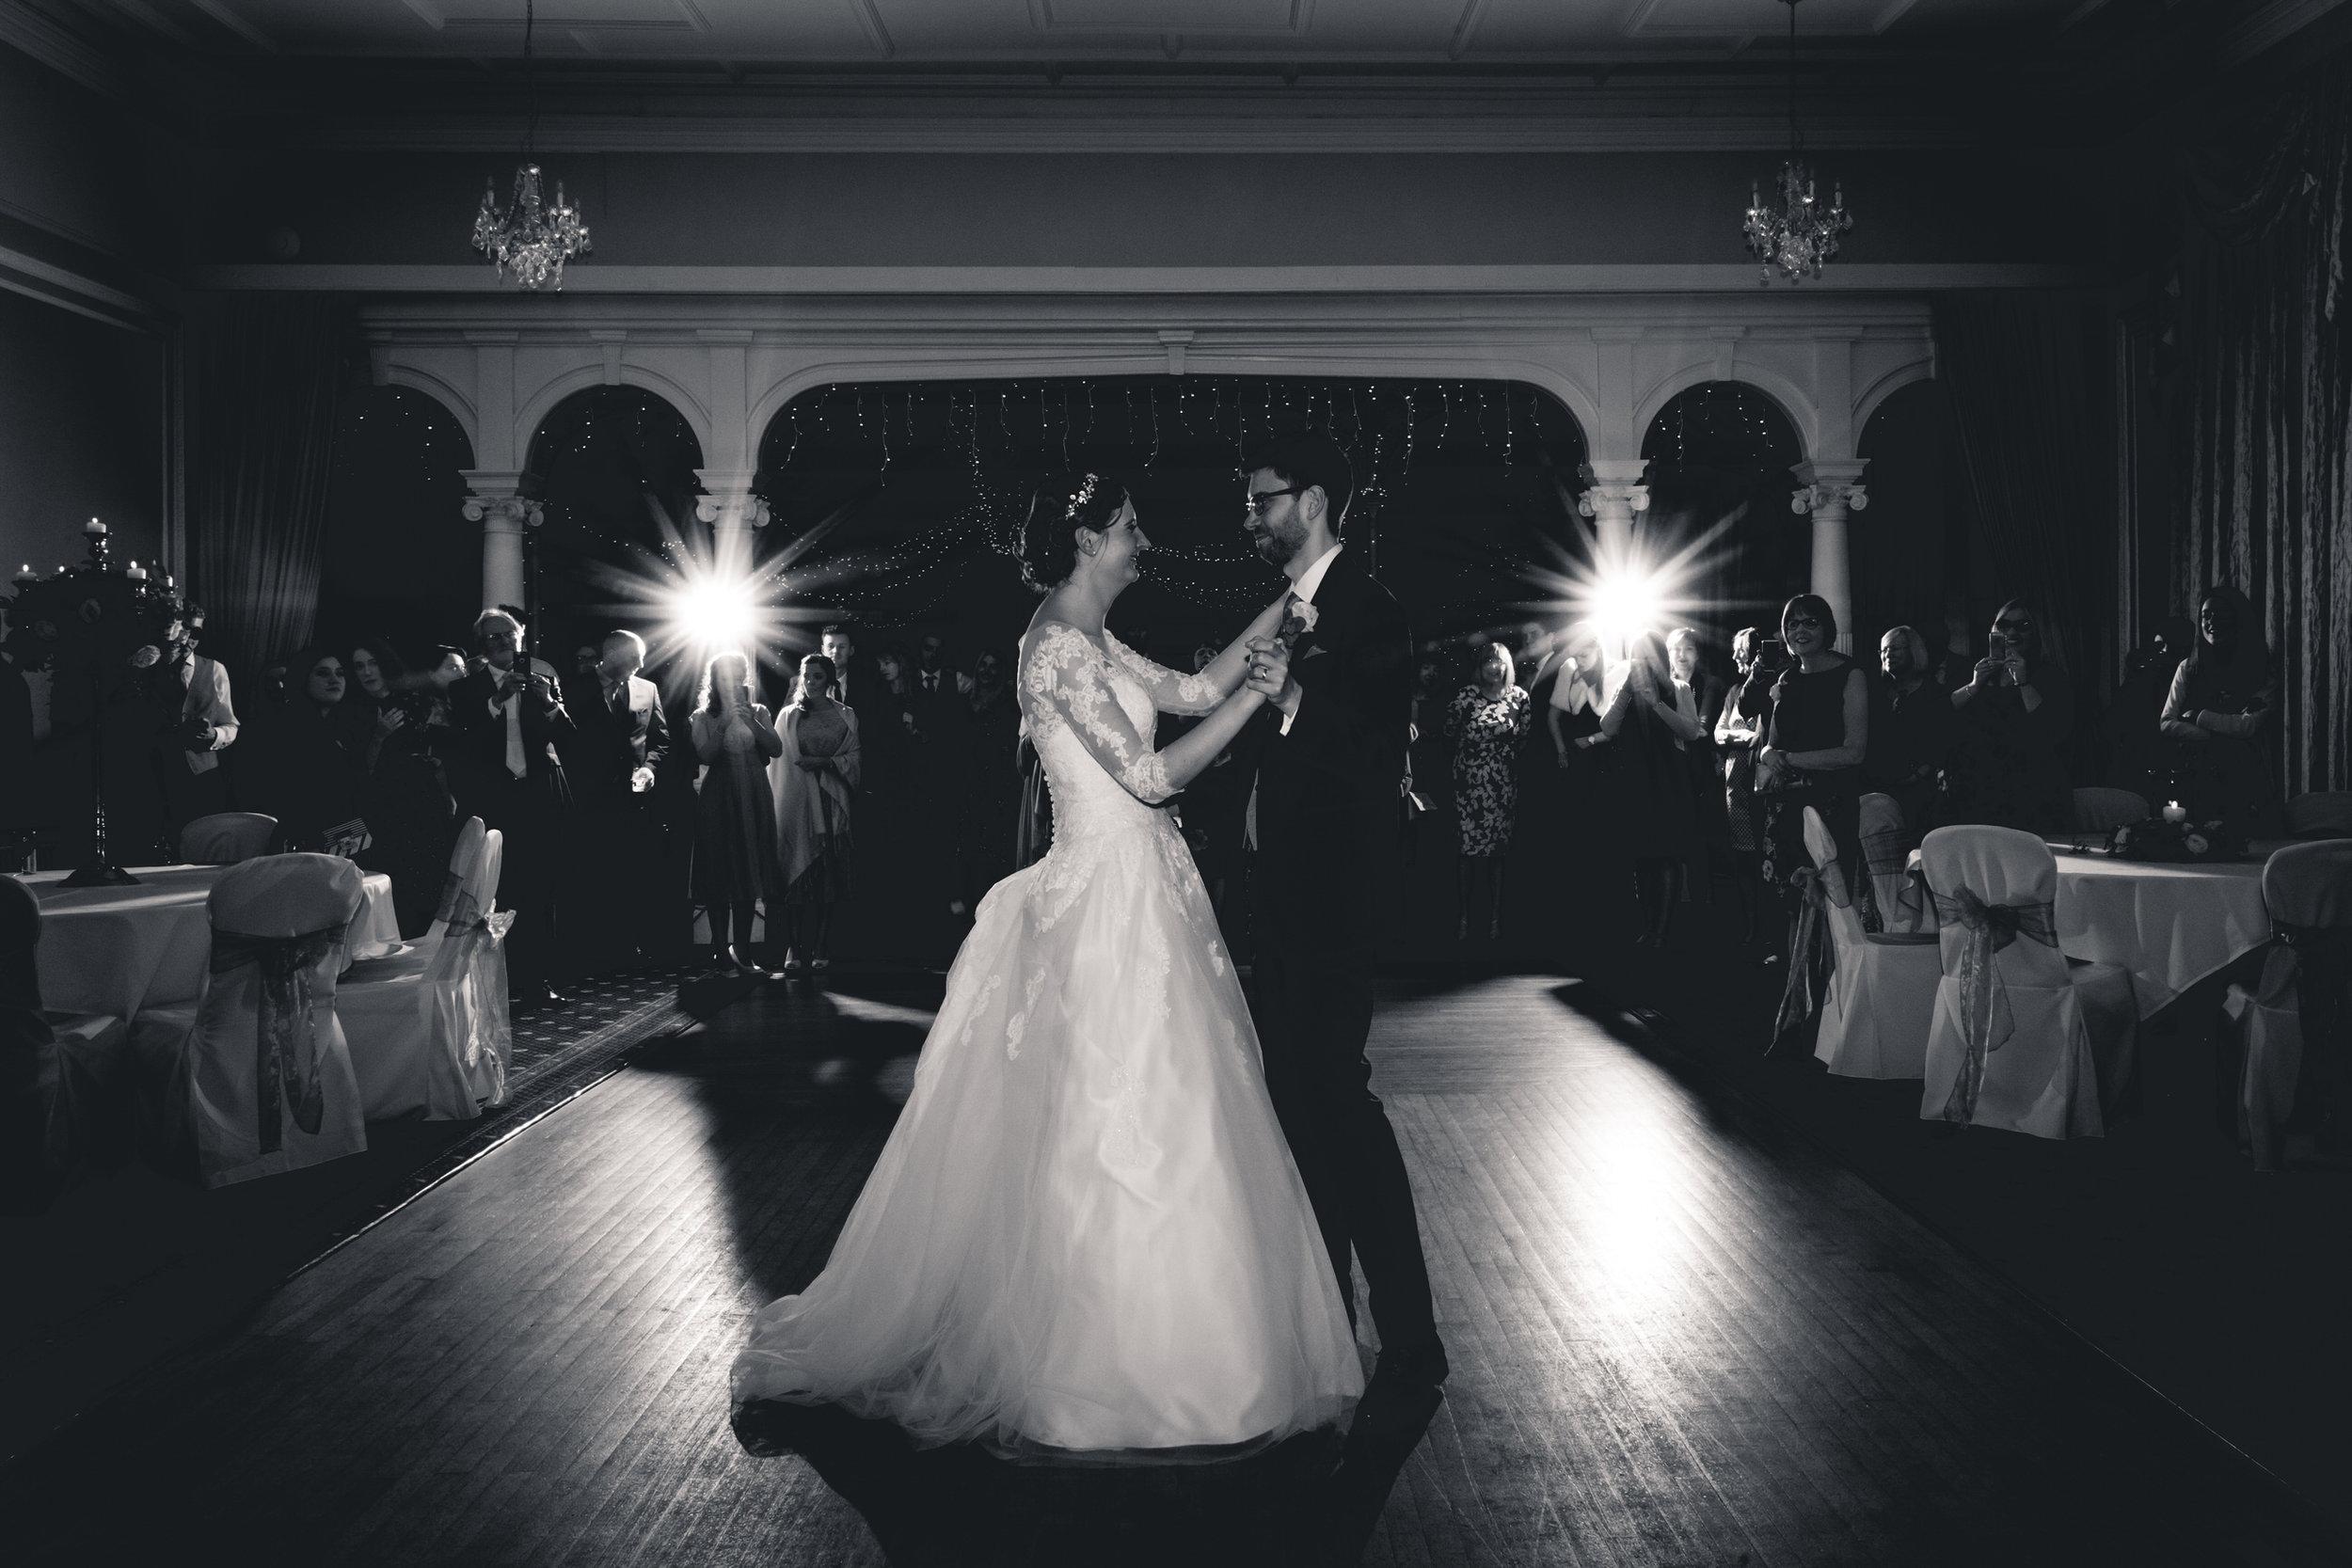 The-Old-Swan-Hotel-Harrogate-Wedding-Photographer-4.jpg